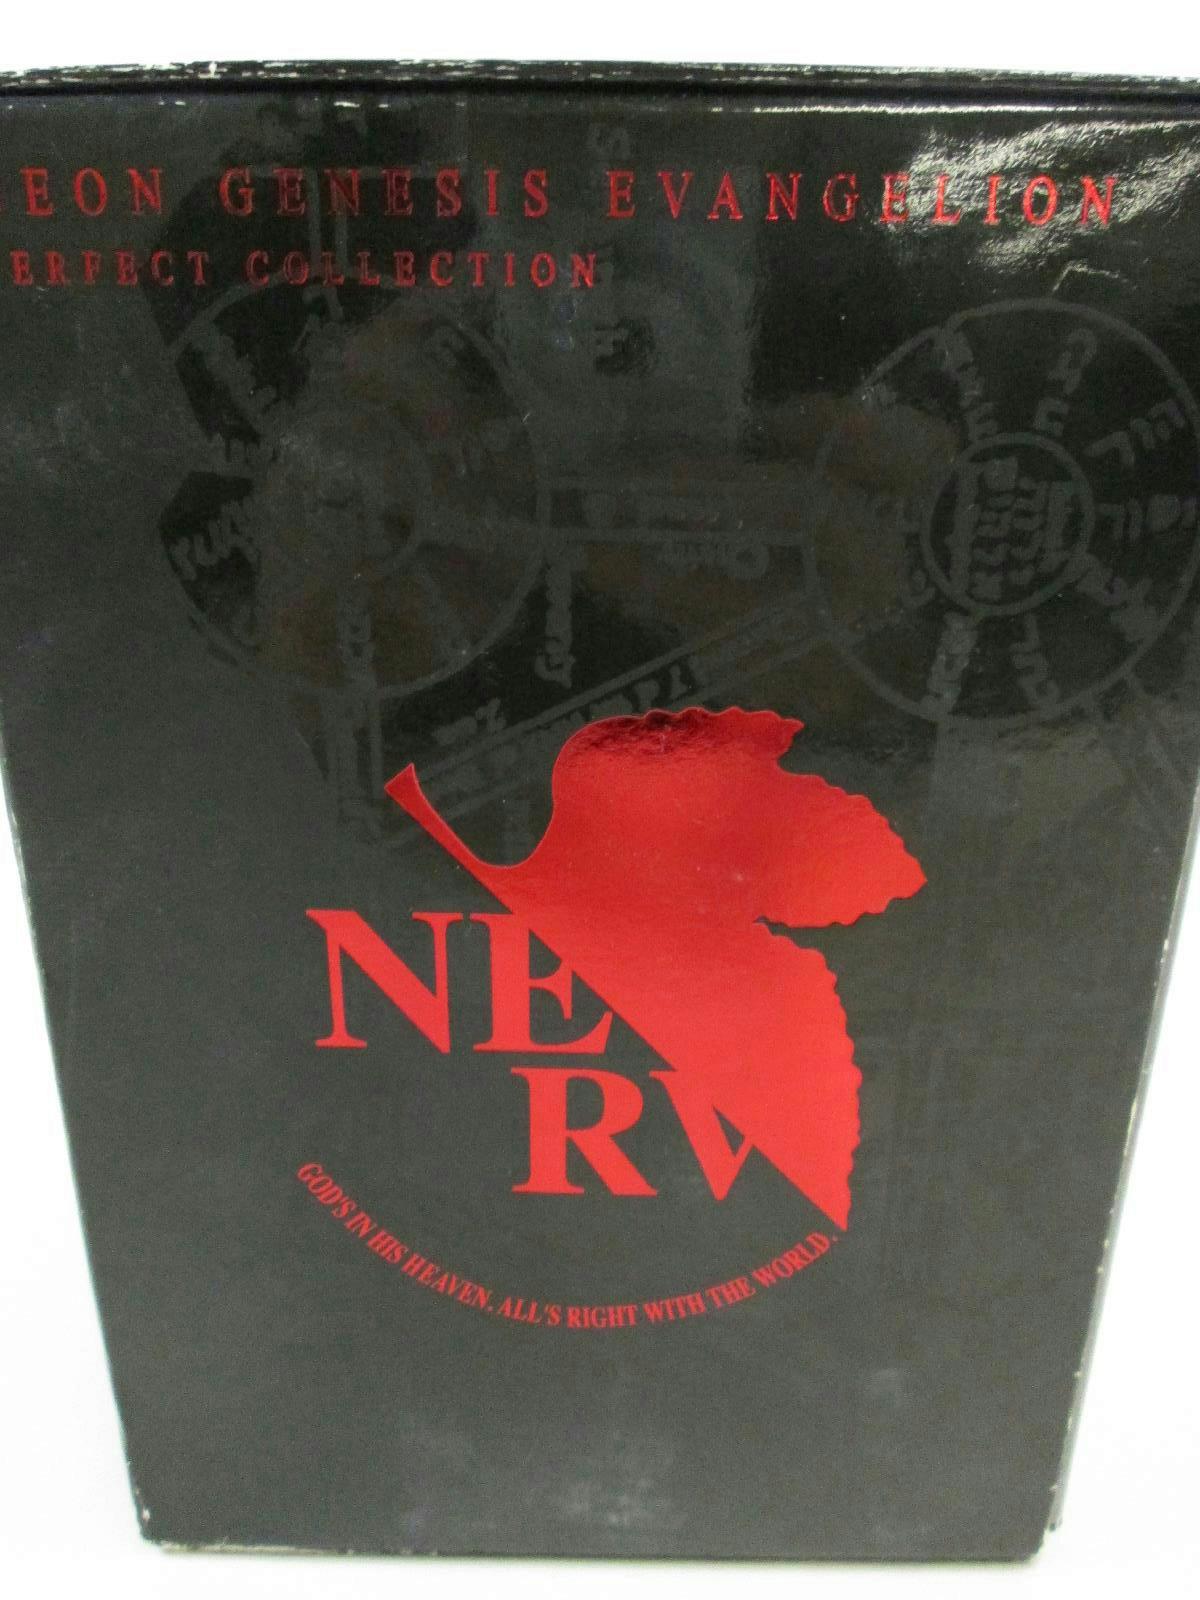 Neon Genesis Evangelion Perfect Collection DVD Box Set | eBay